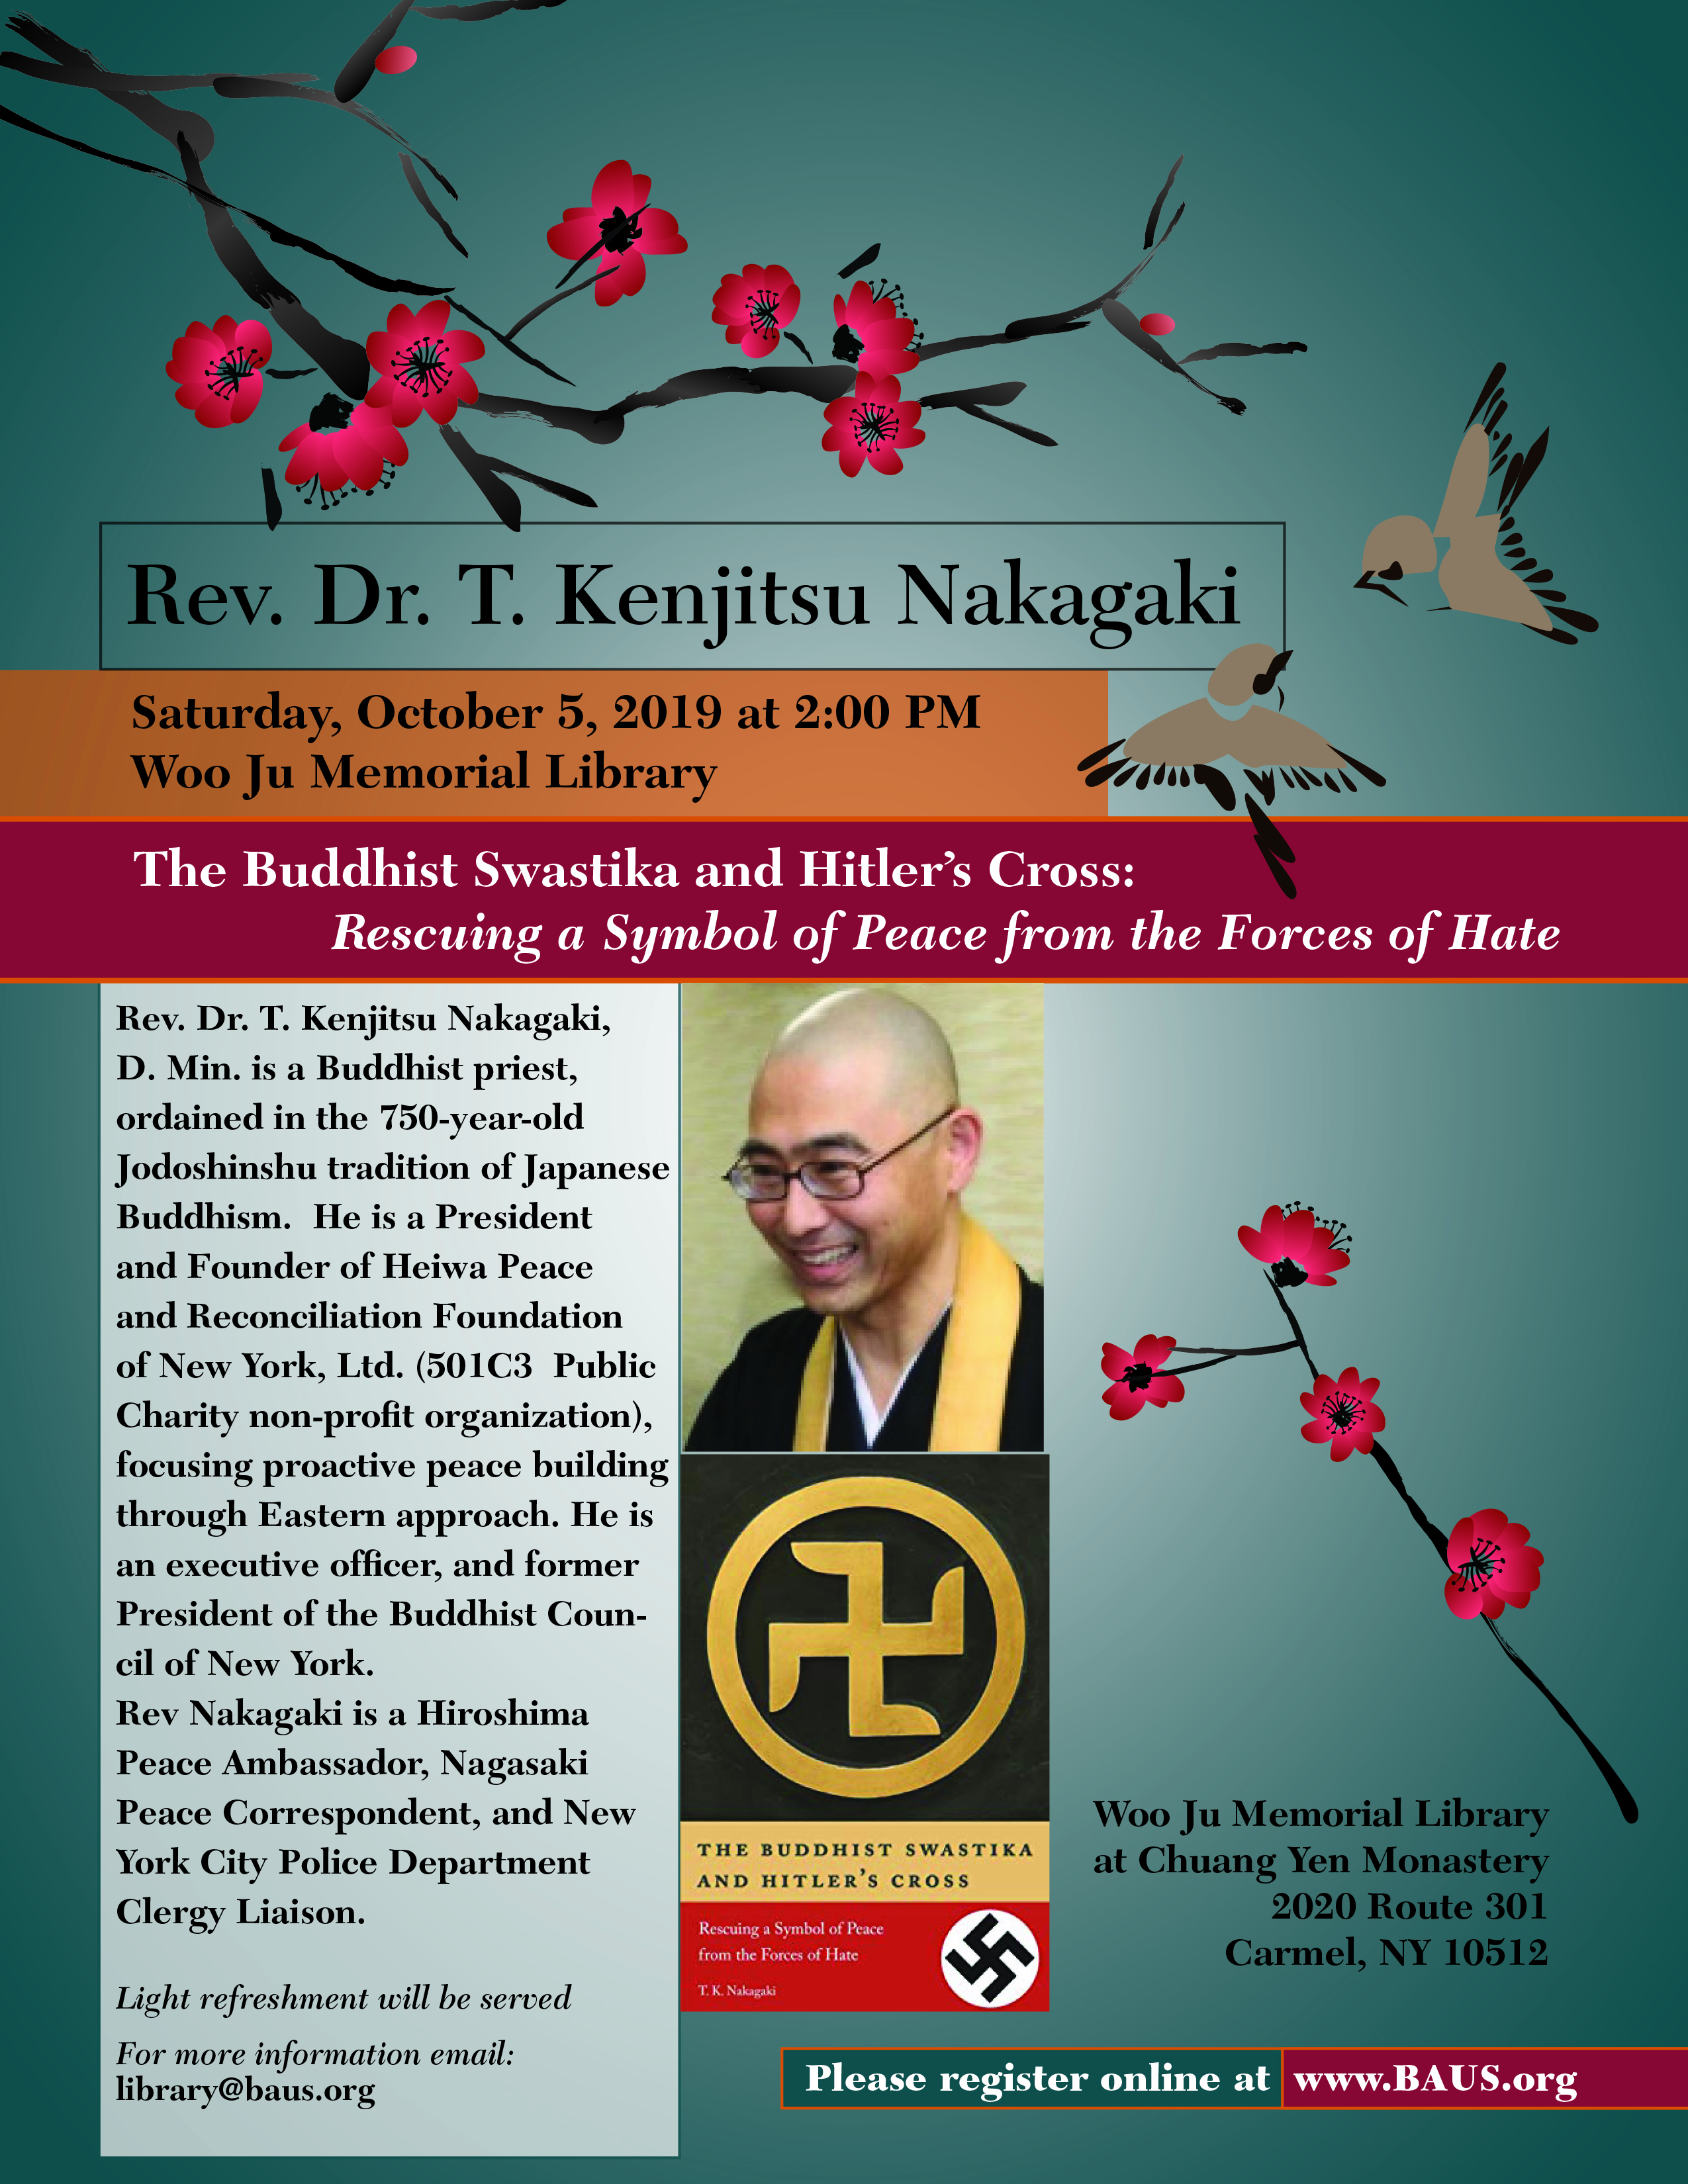 Rev  Dr  T  Kenjitsu Nakagaki presents: The Buddhist